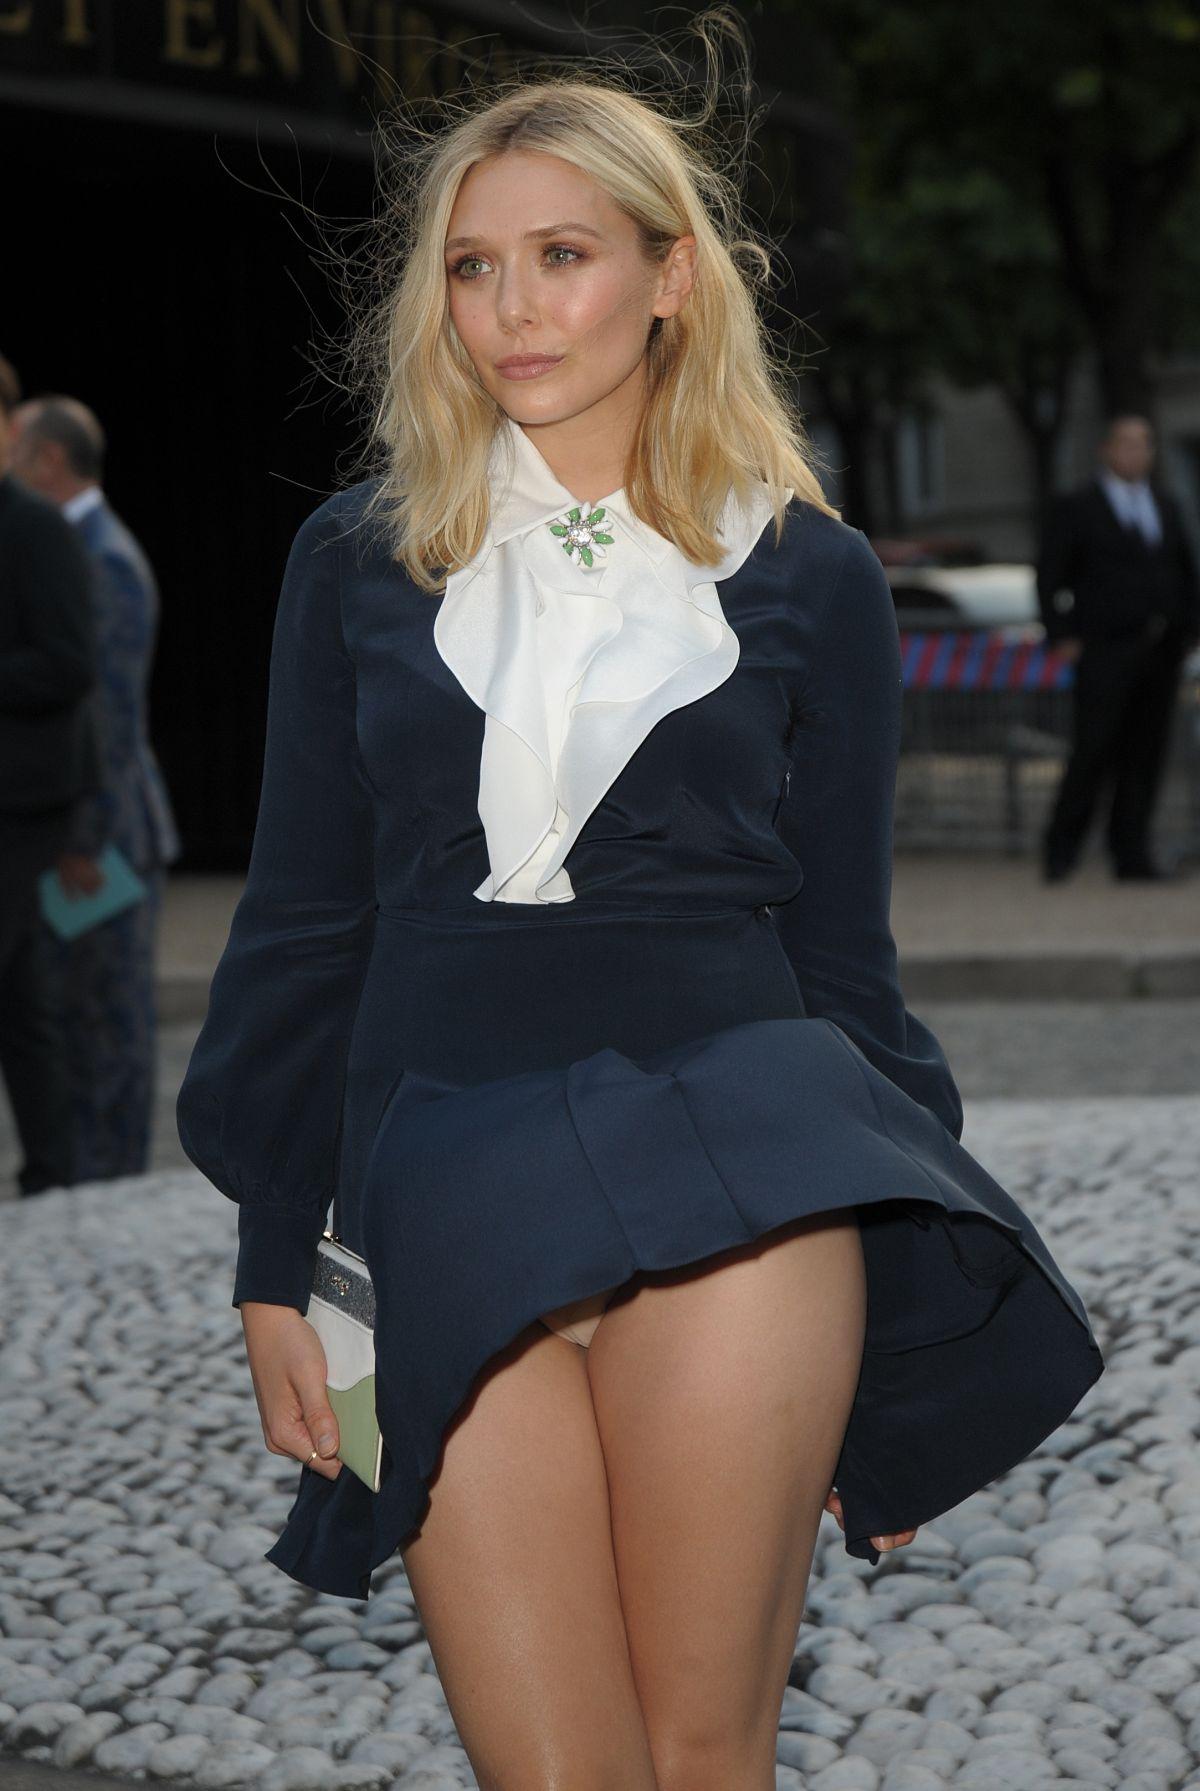 Pin Elizabeth Olsen Bikini on Pinterest